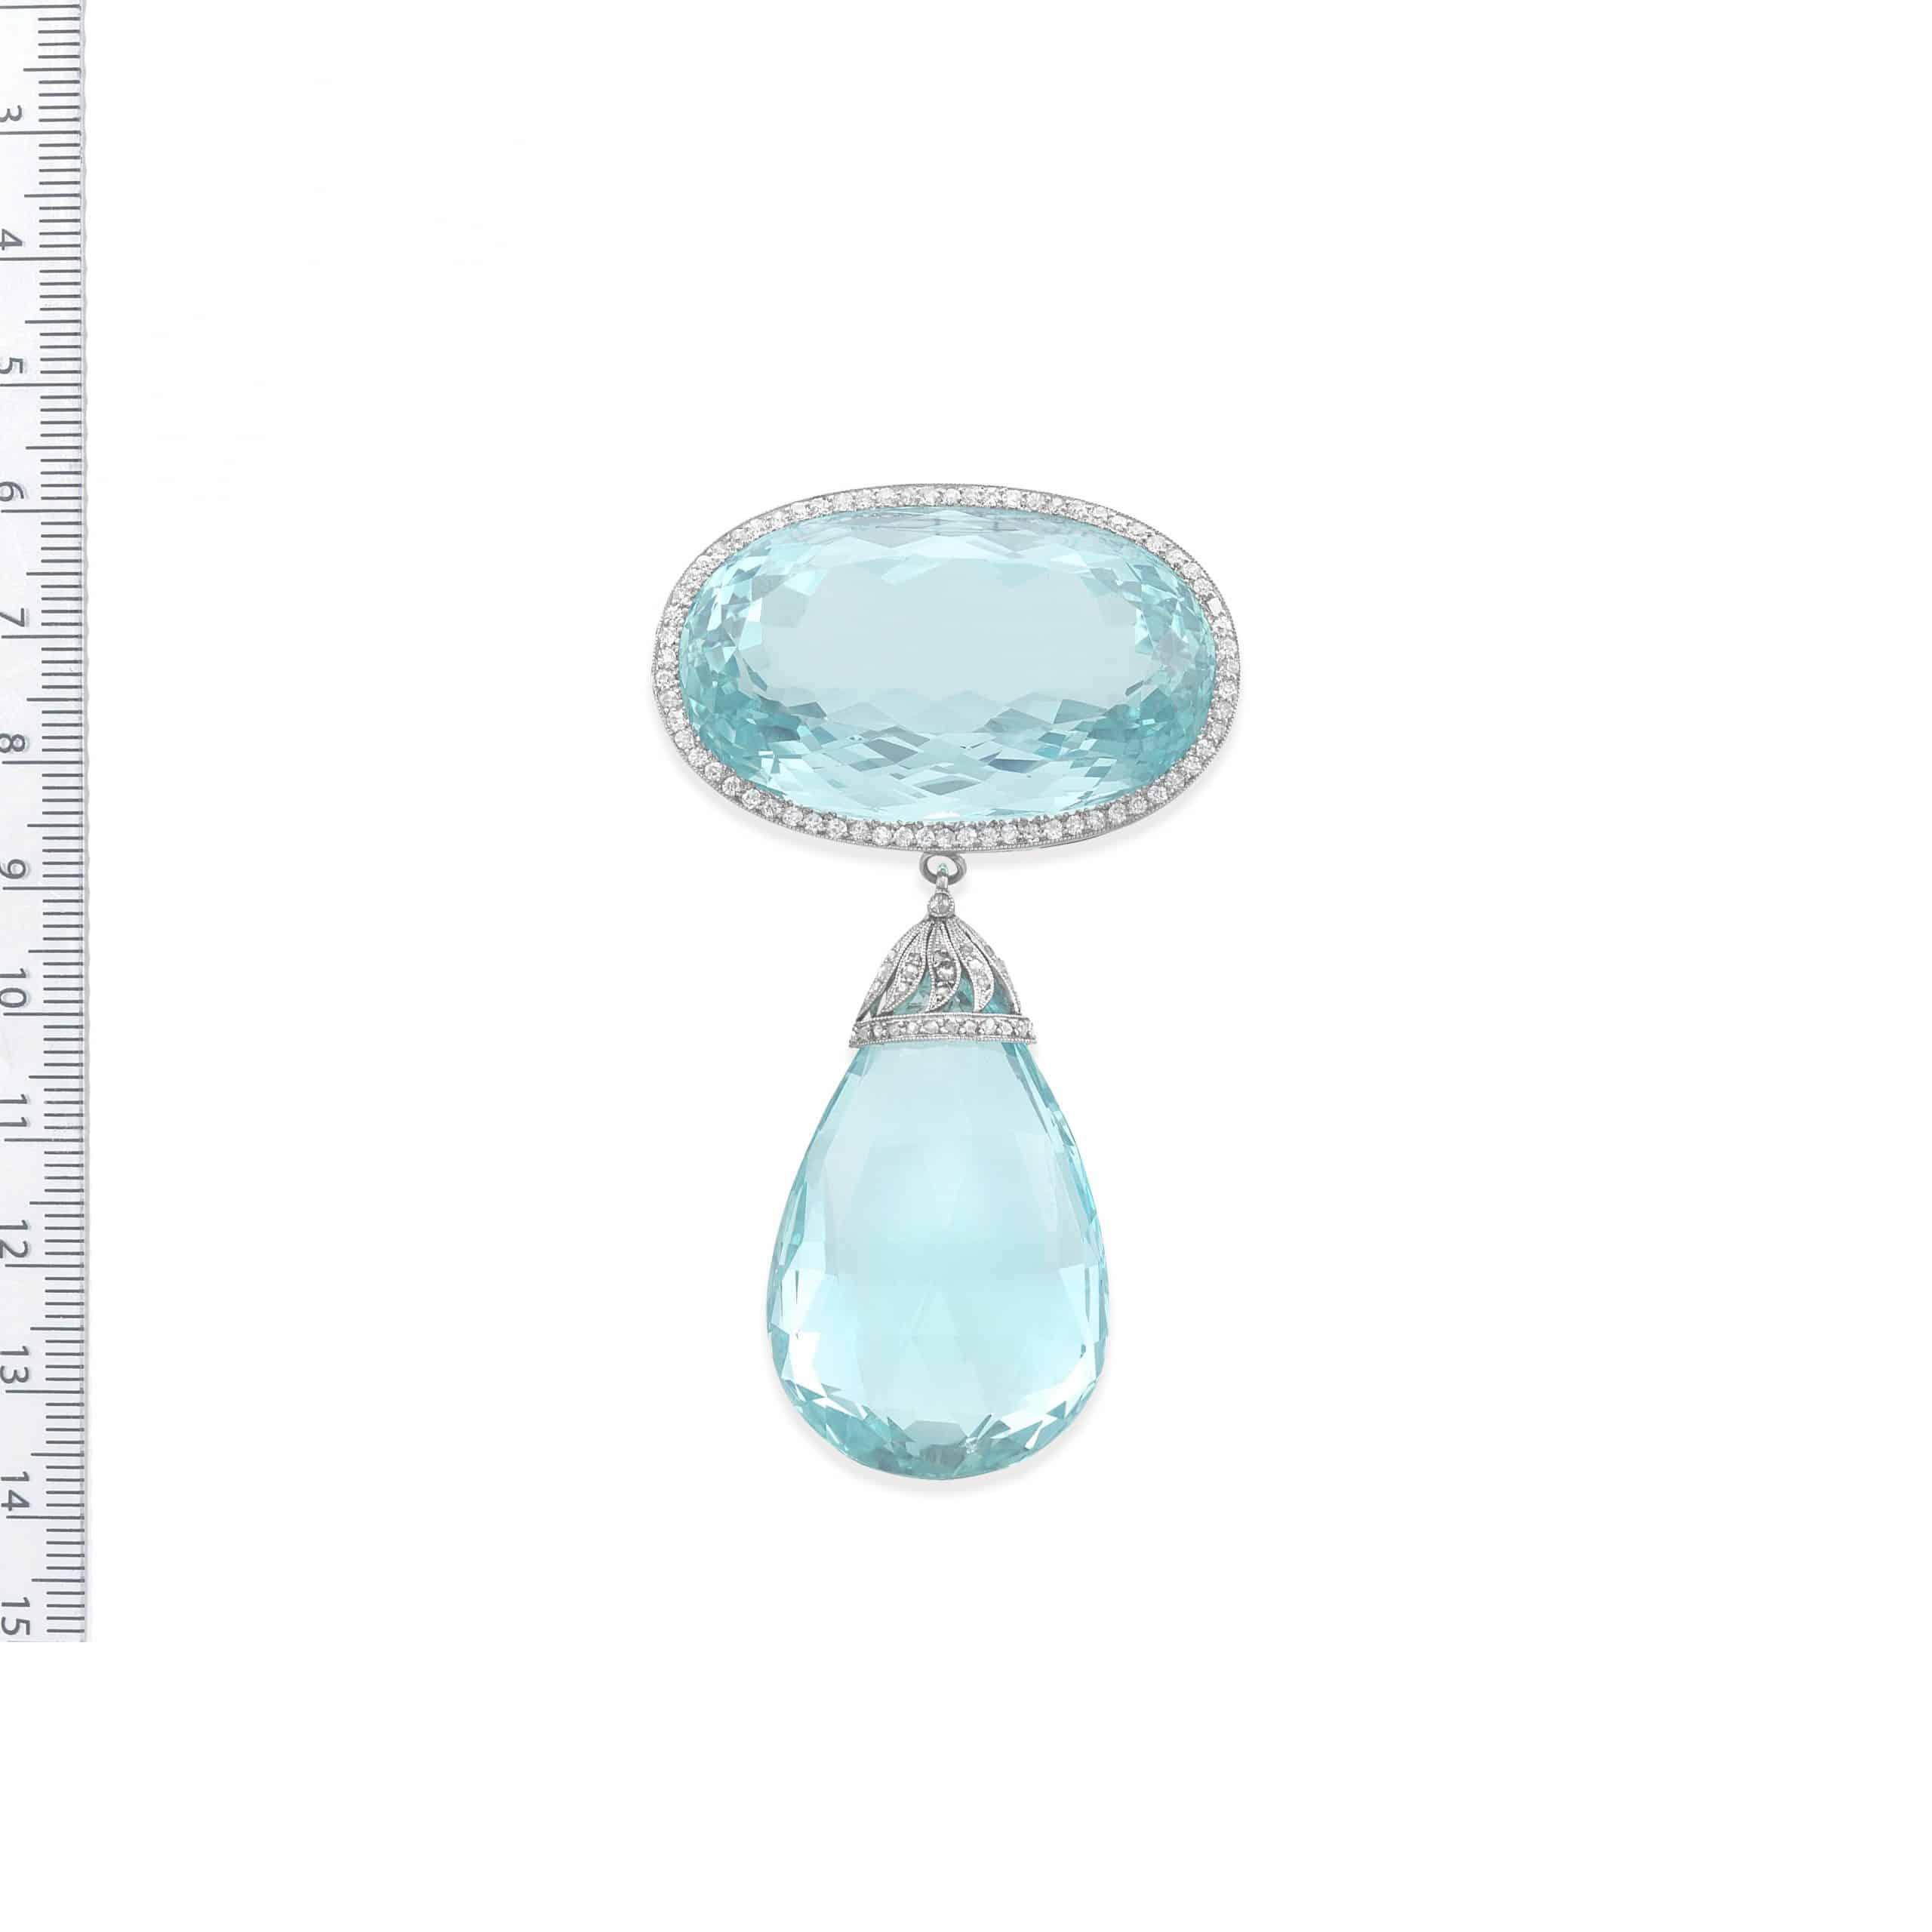 A Belle Époque aquamarine and diamond brooch